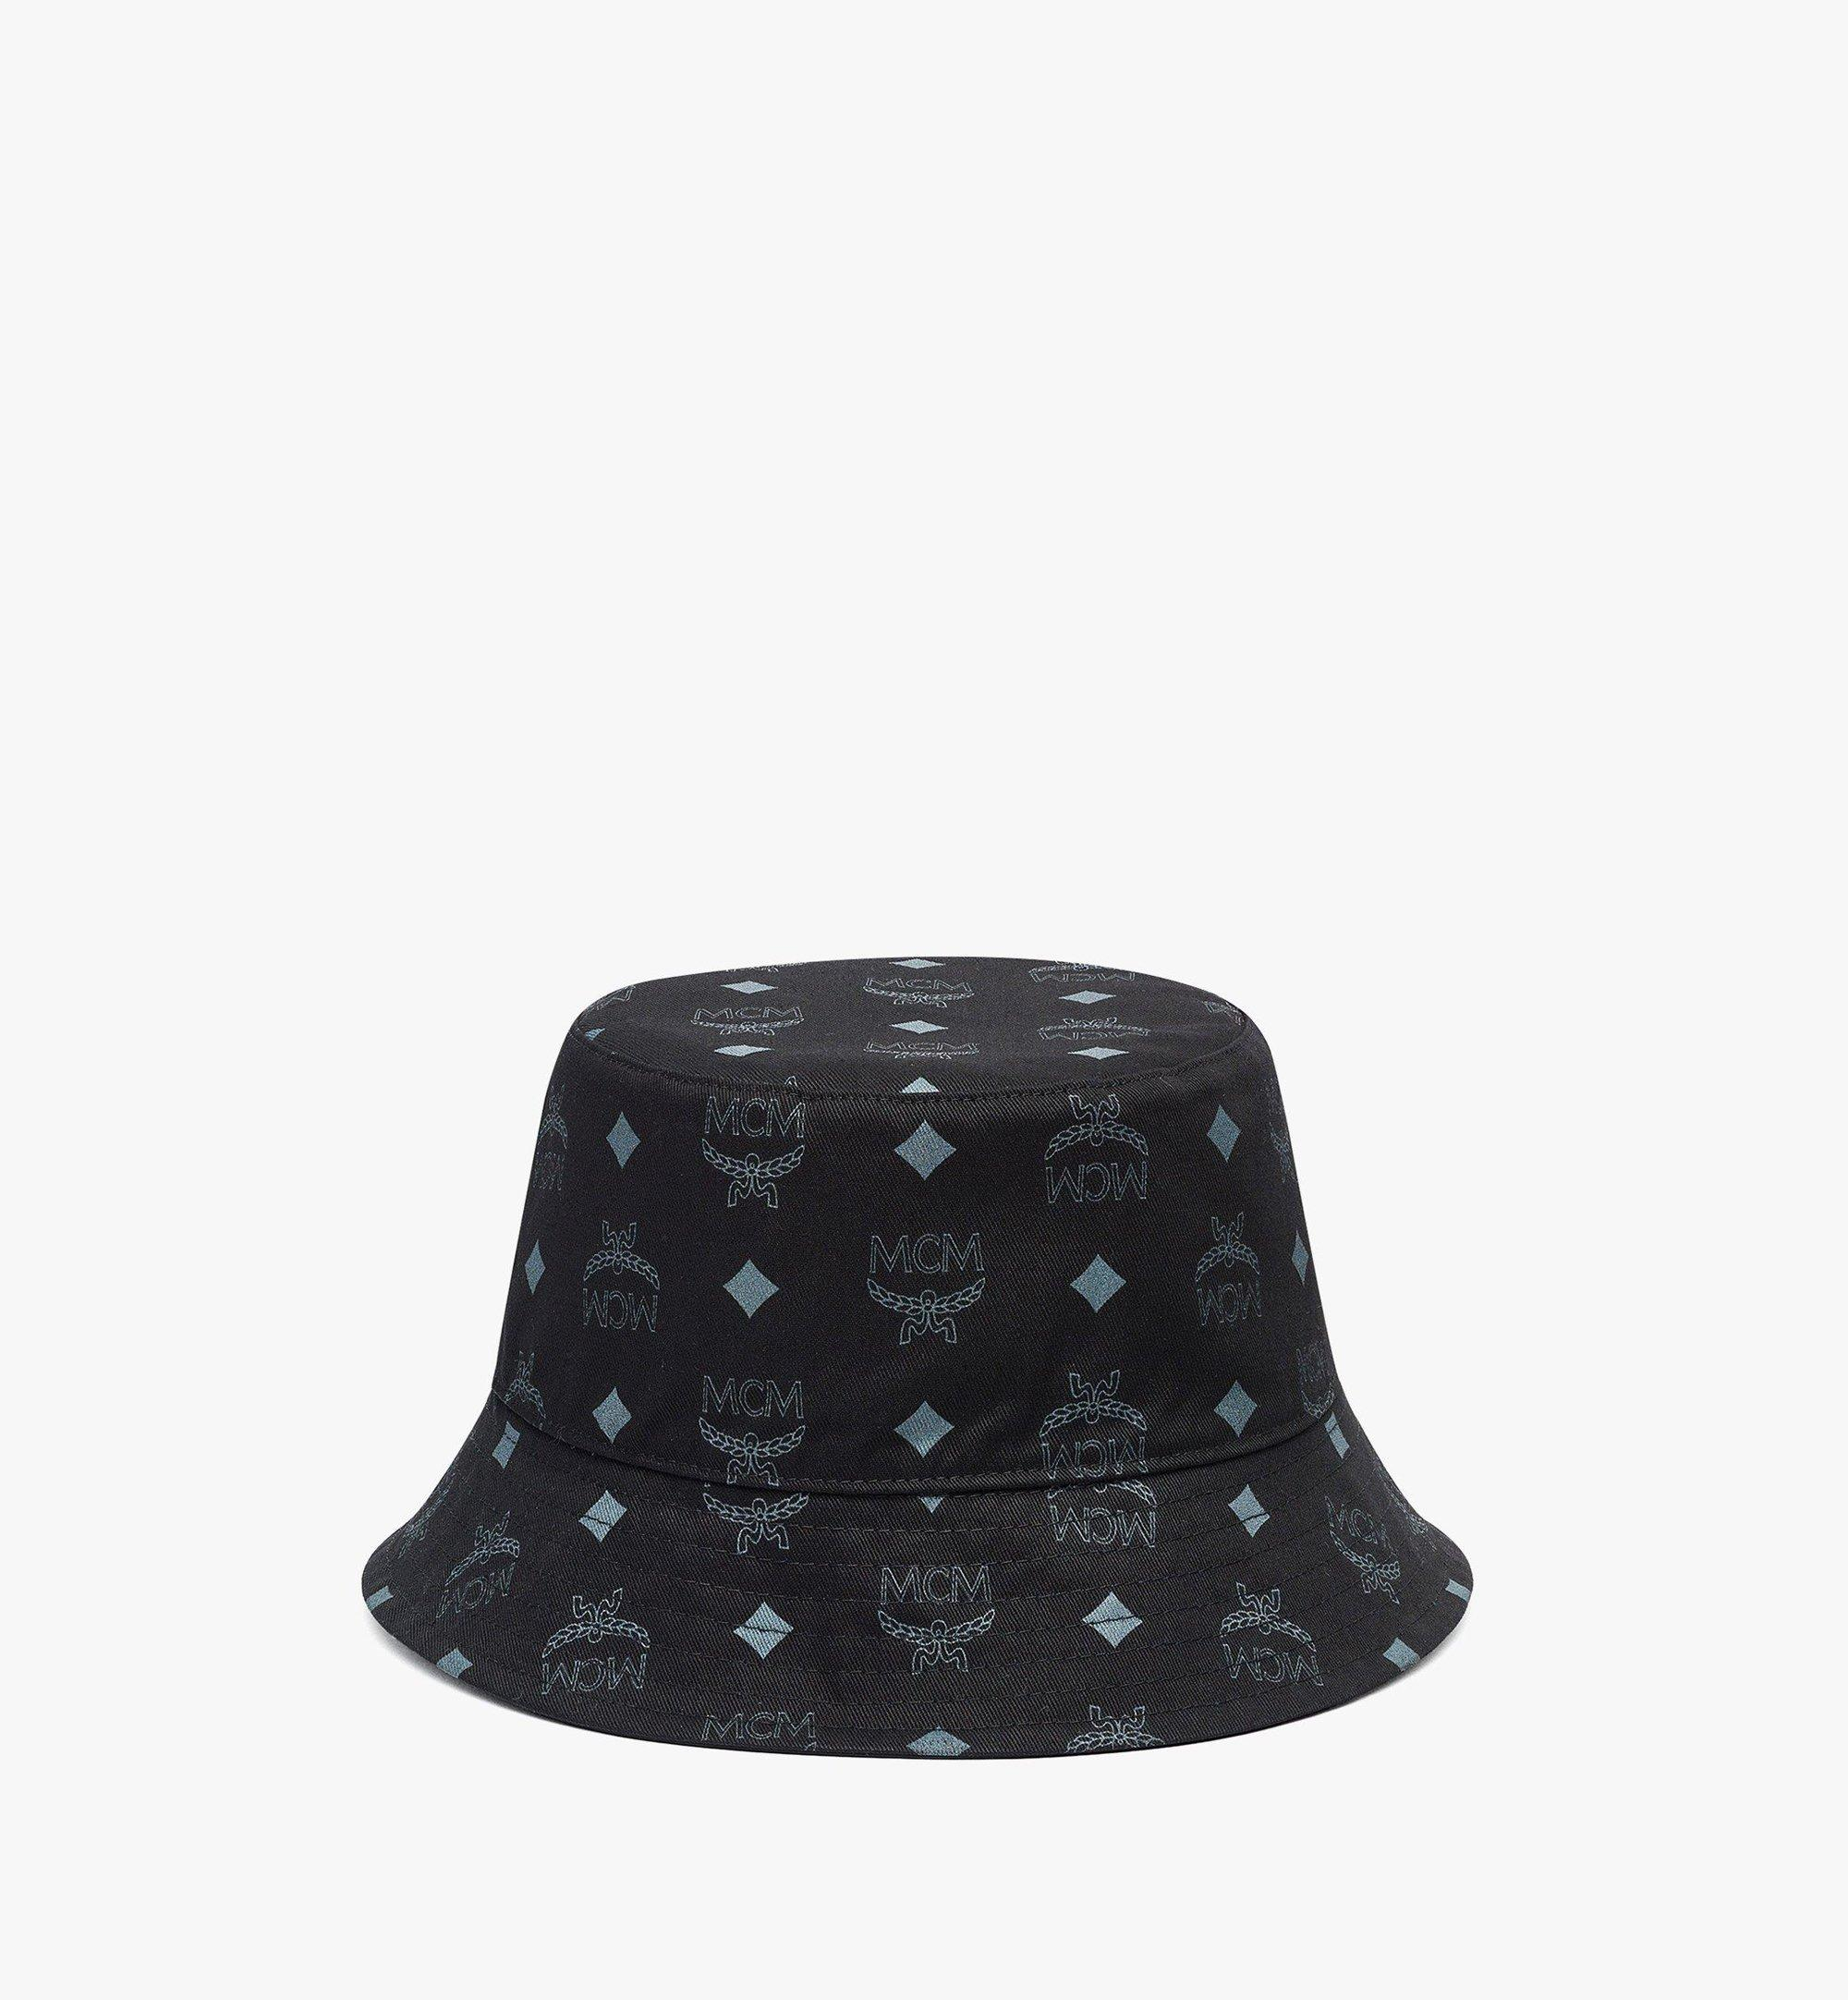 MCM MCM x SAMBYPEN Bucket Hat Black MEHBASP01BK001 Alternate View 2